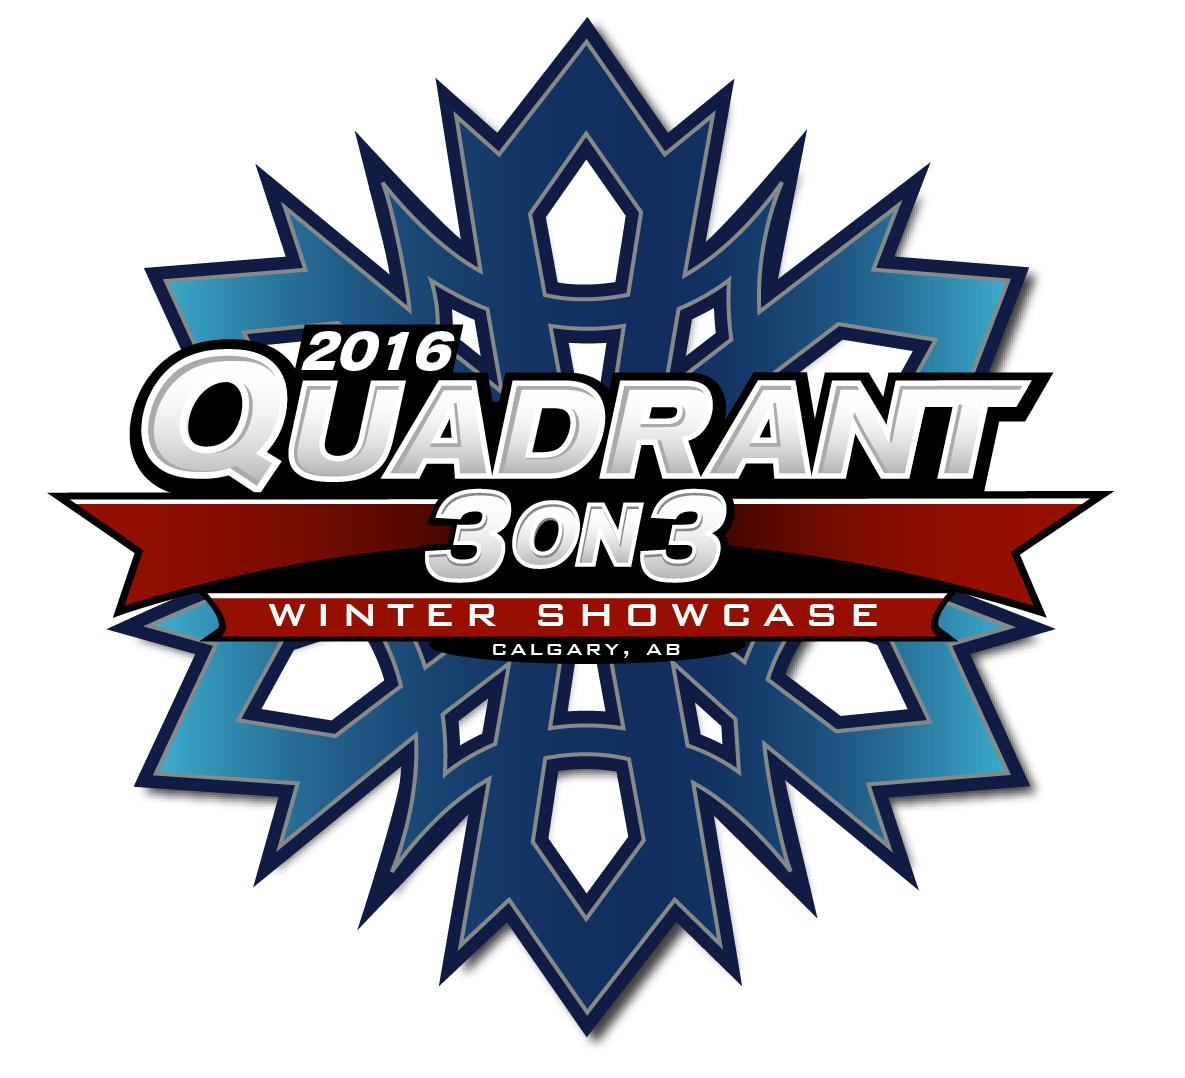 Quadrant Winter Showcase 2016